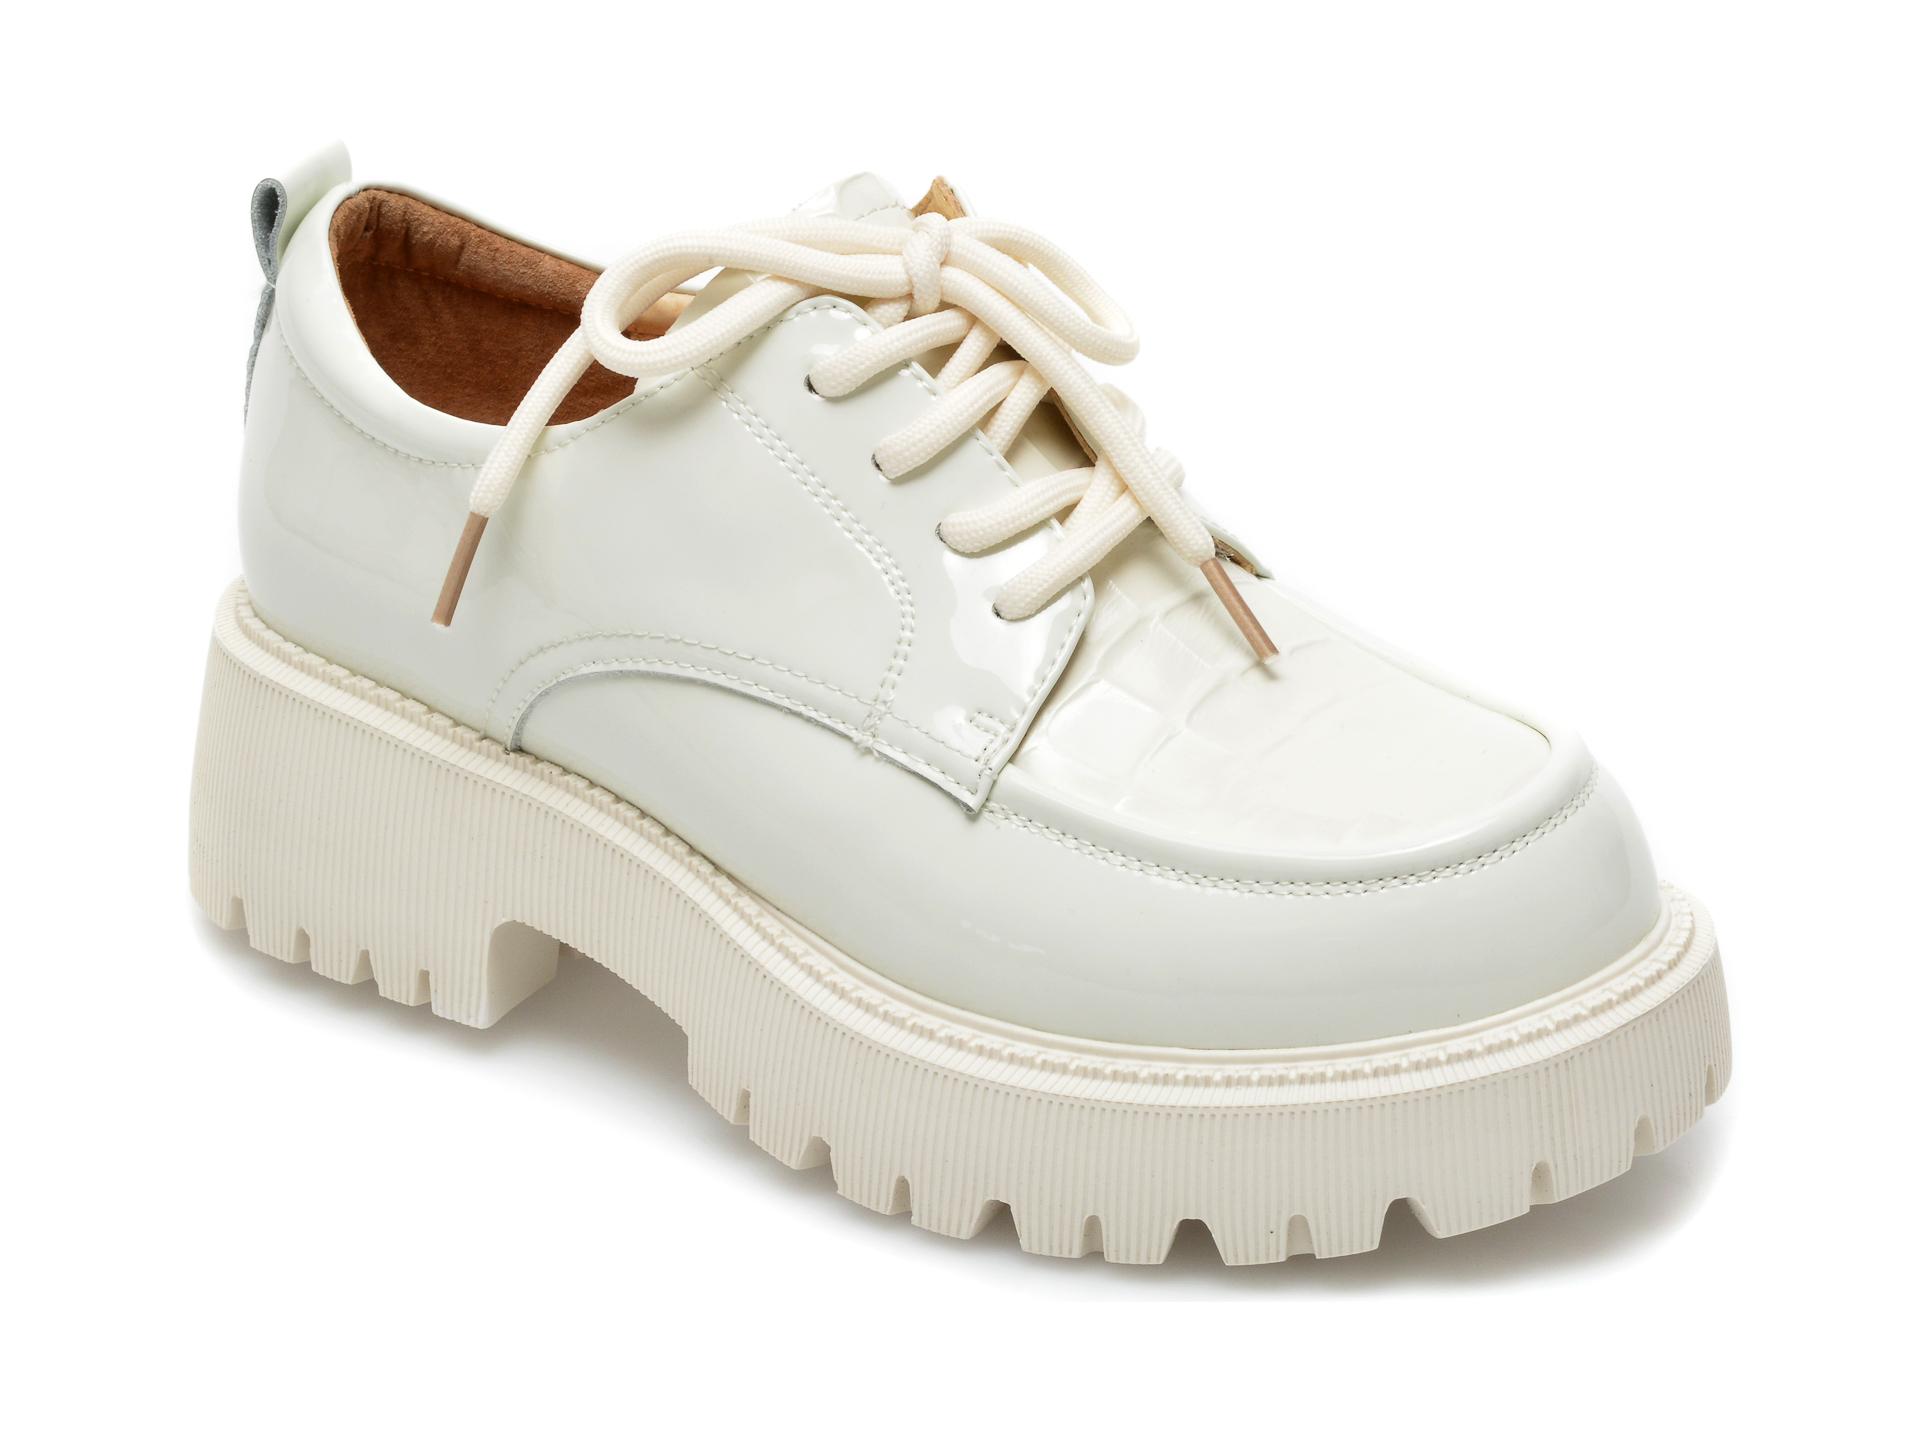 Pantofi GRYXX albi, A21170, din piele naturala lacuita imagine otter.ro 2021